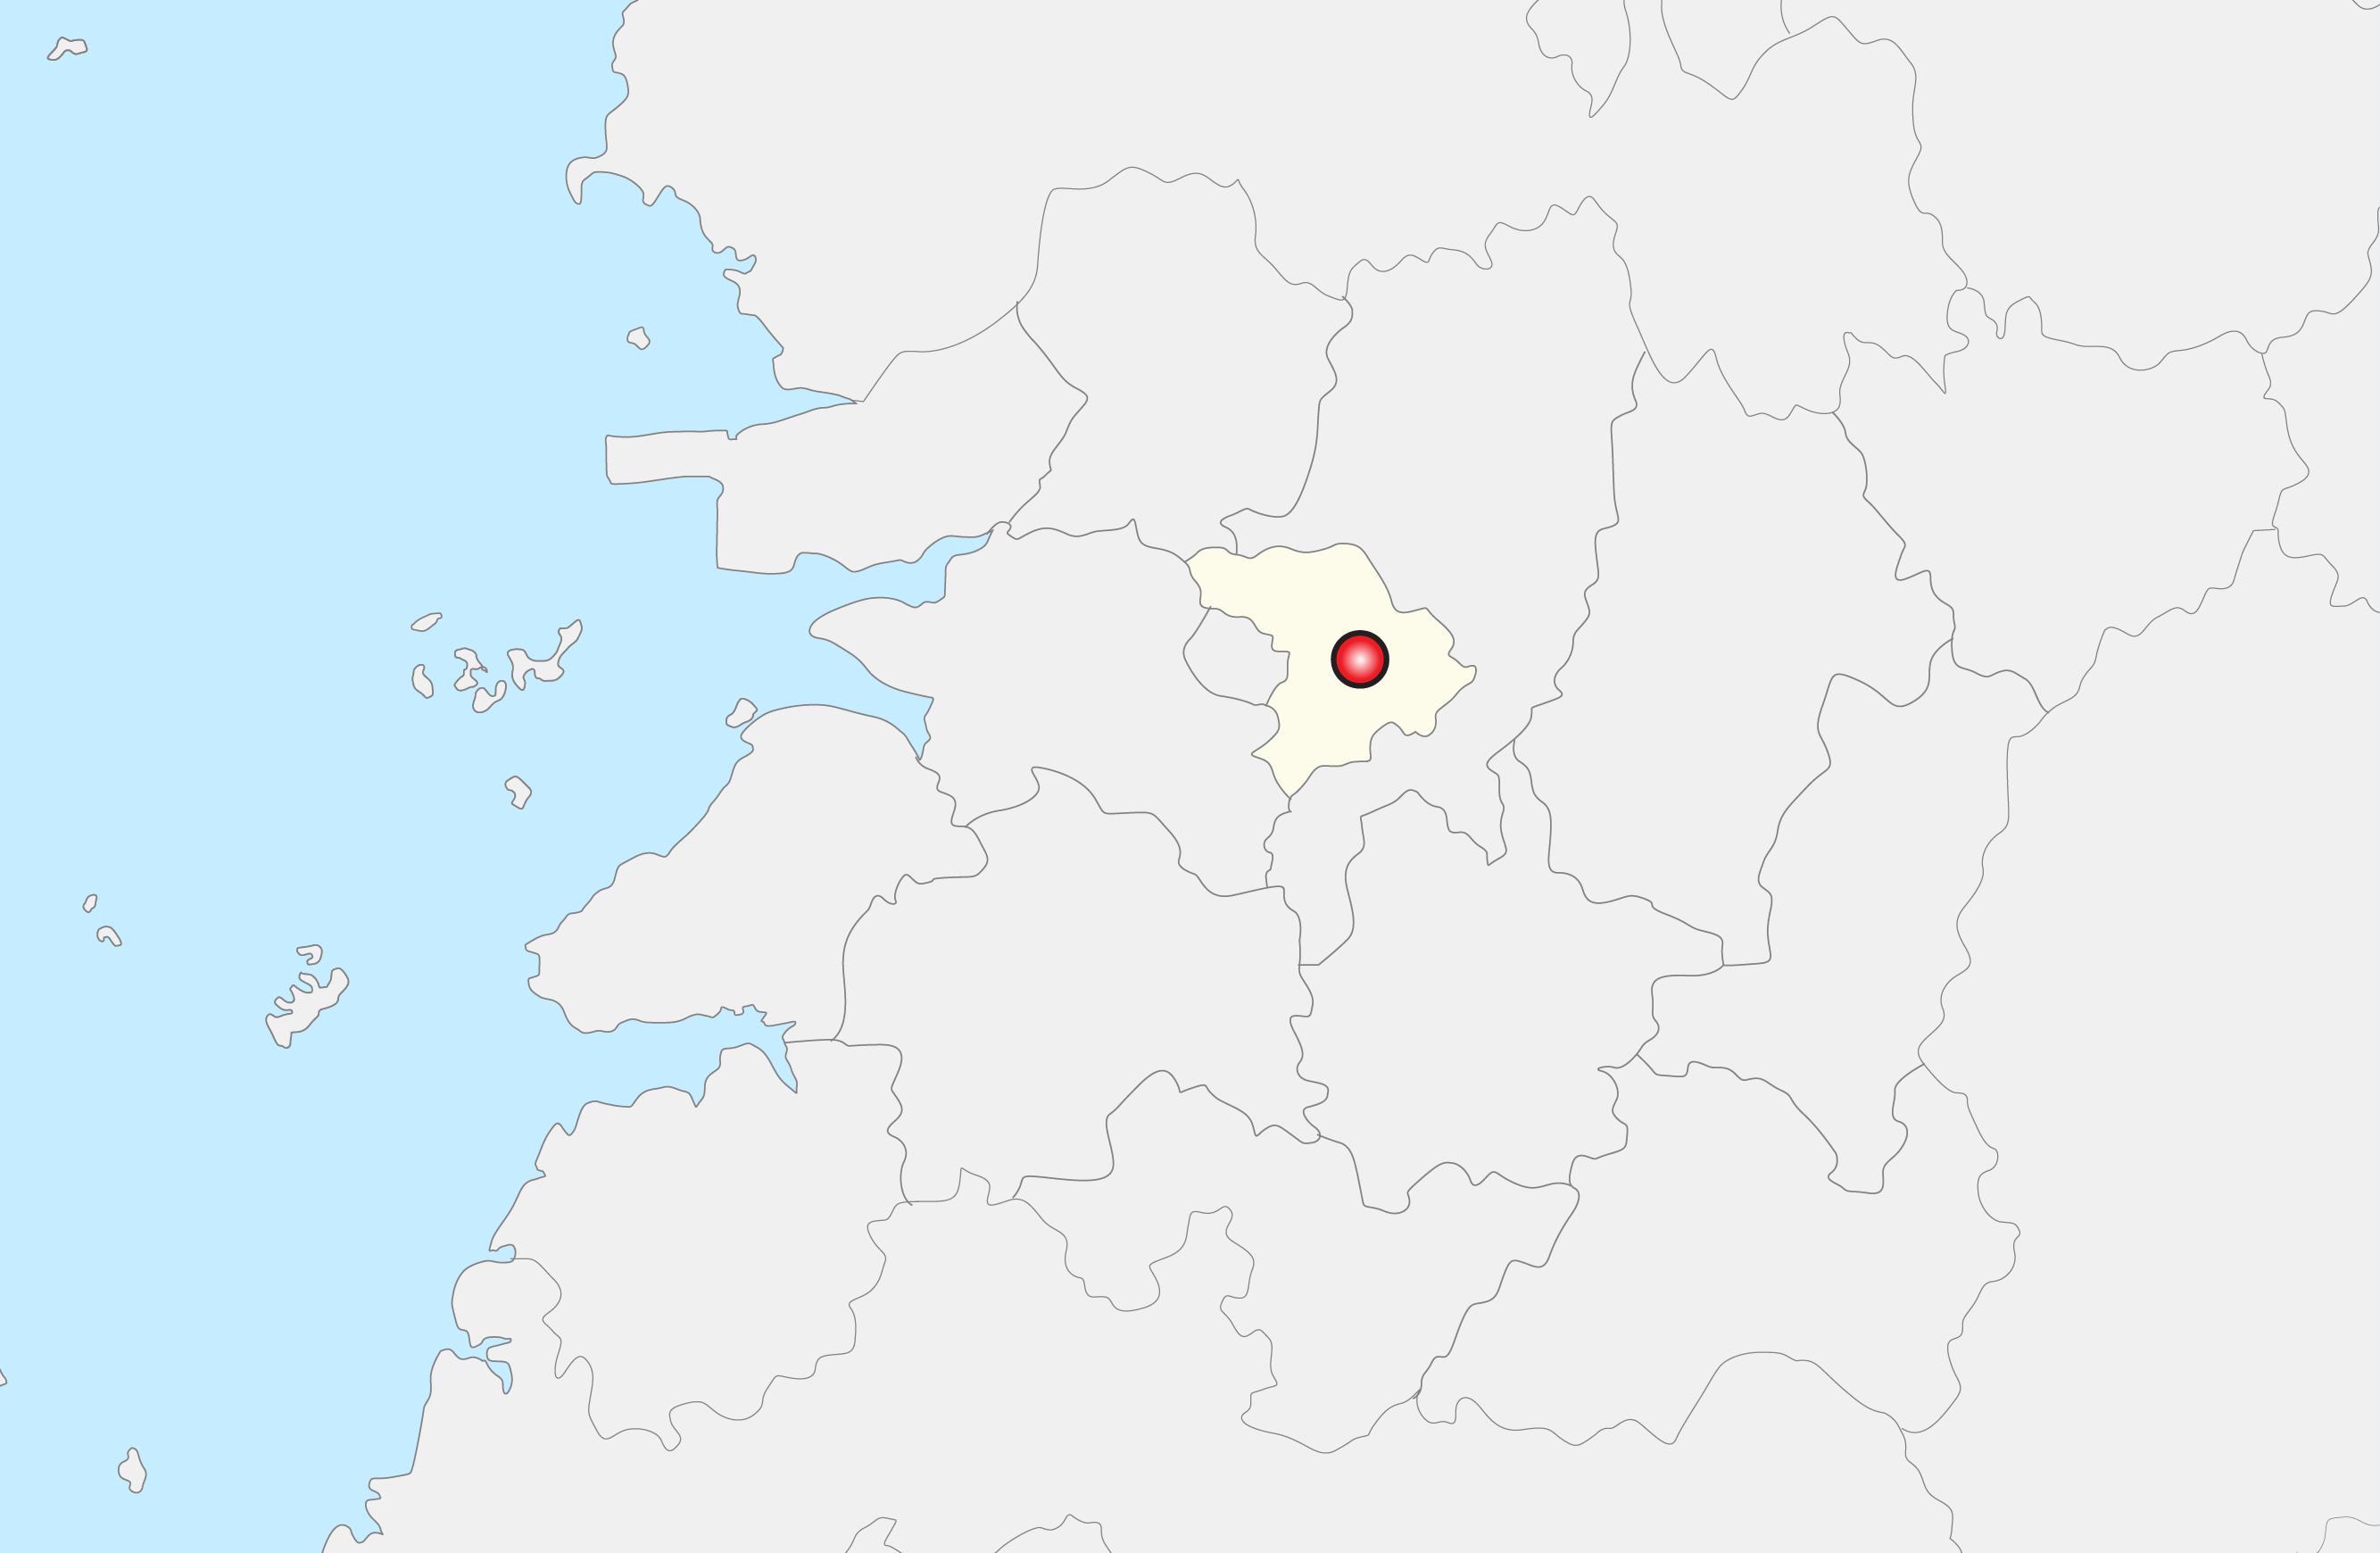 FileMap Jeonjusipng Wikimedia Commons